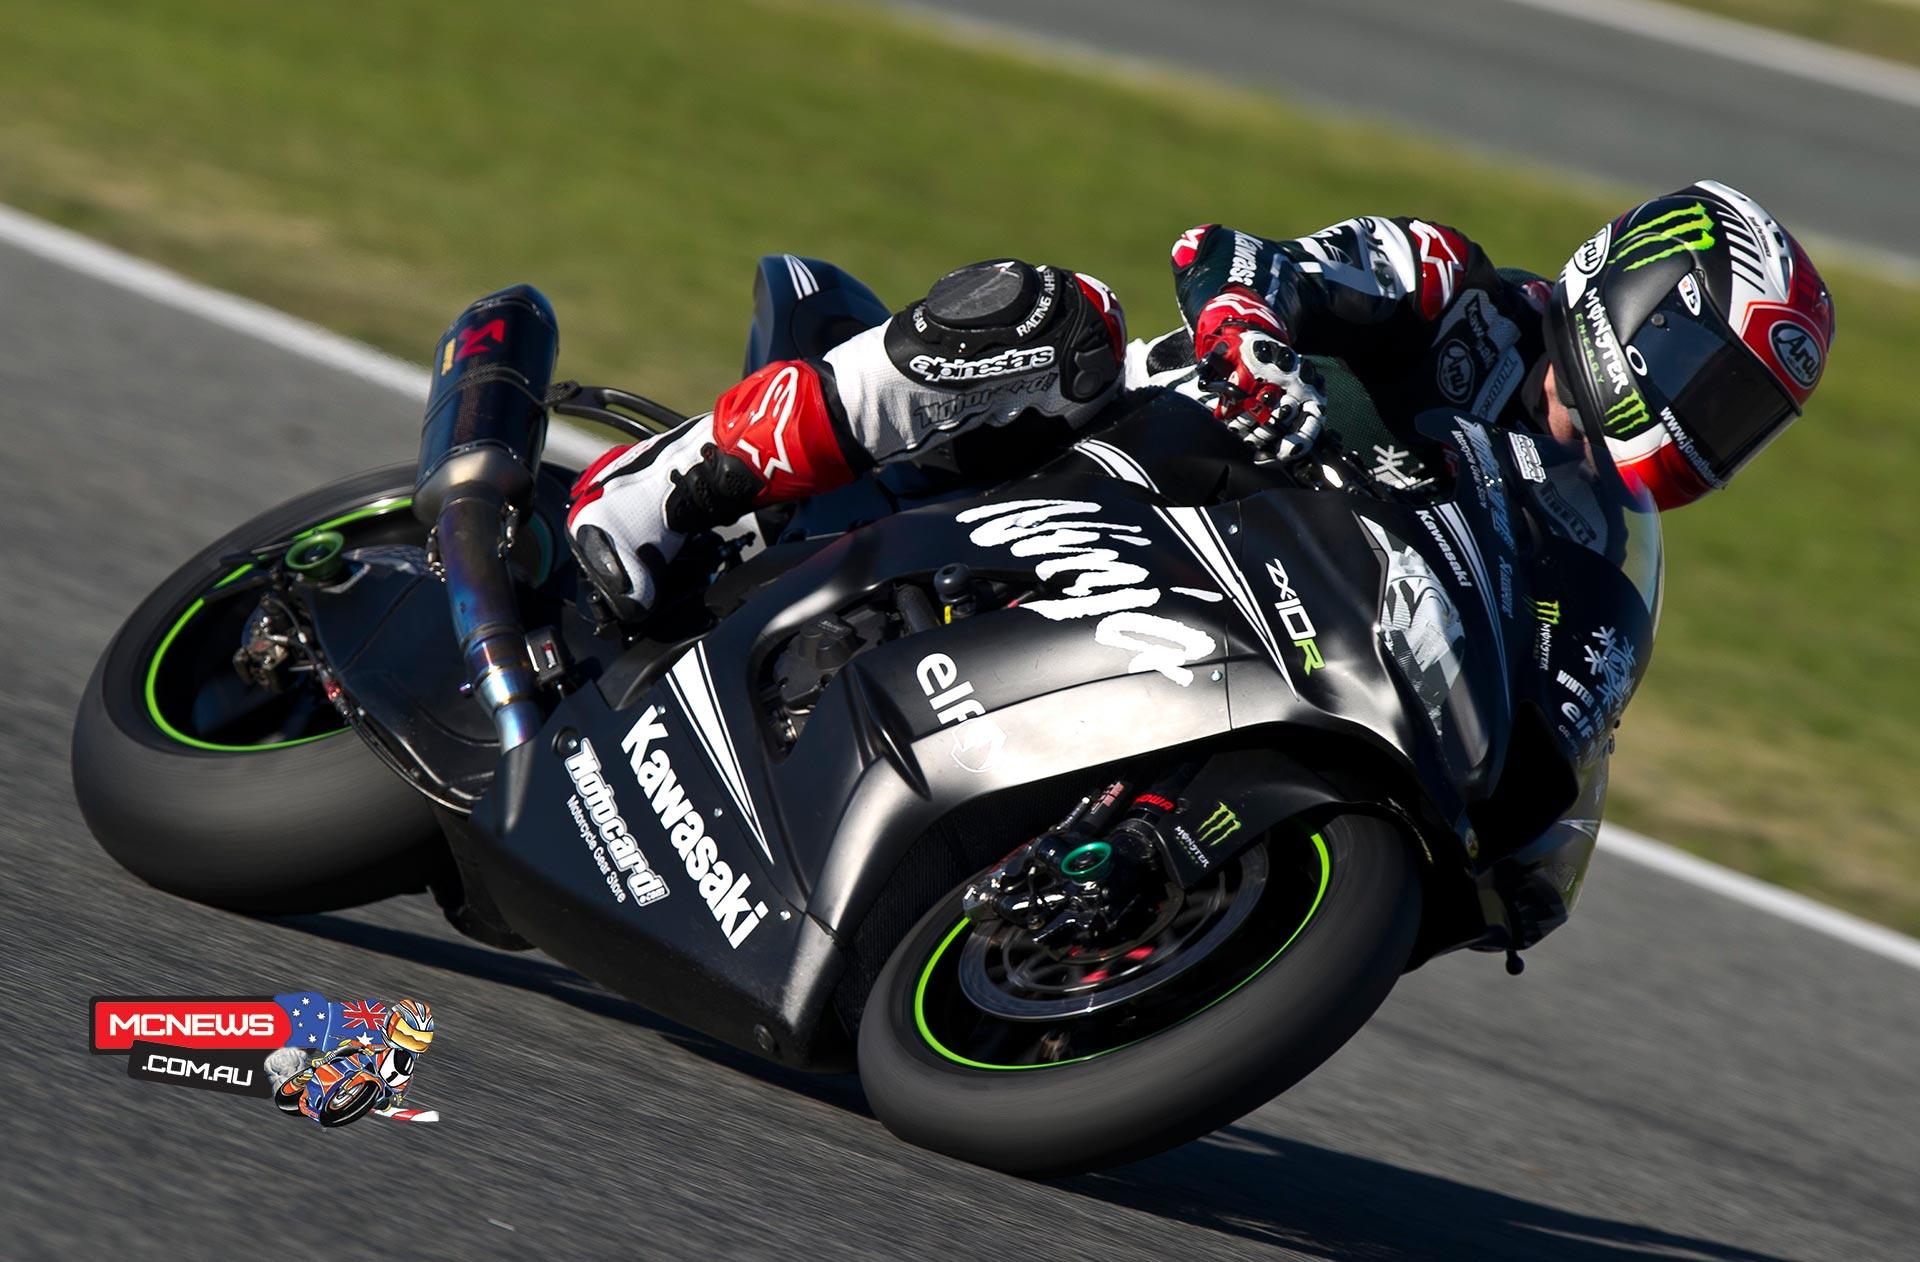 WorldSBK 2016 - Jerez Testing - November, 2015 - Jonathan Rea